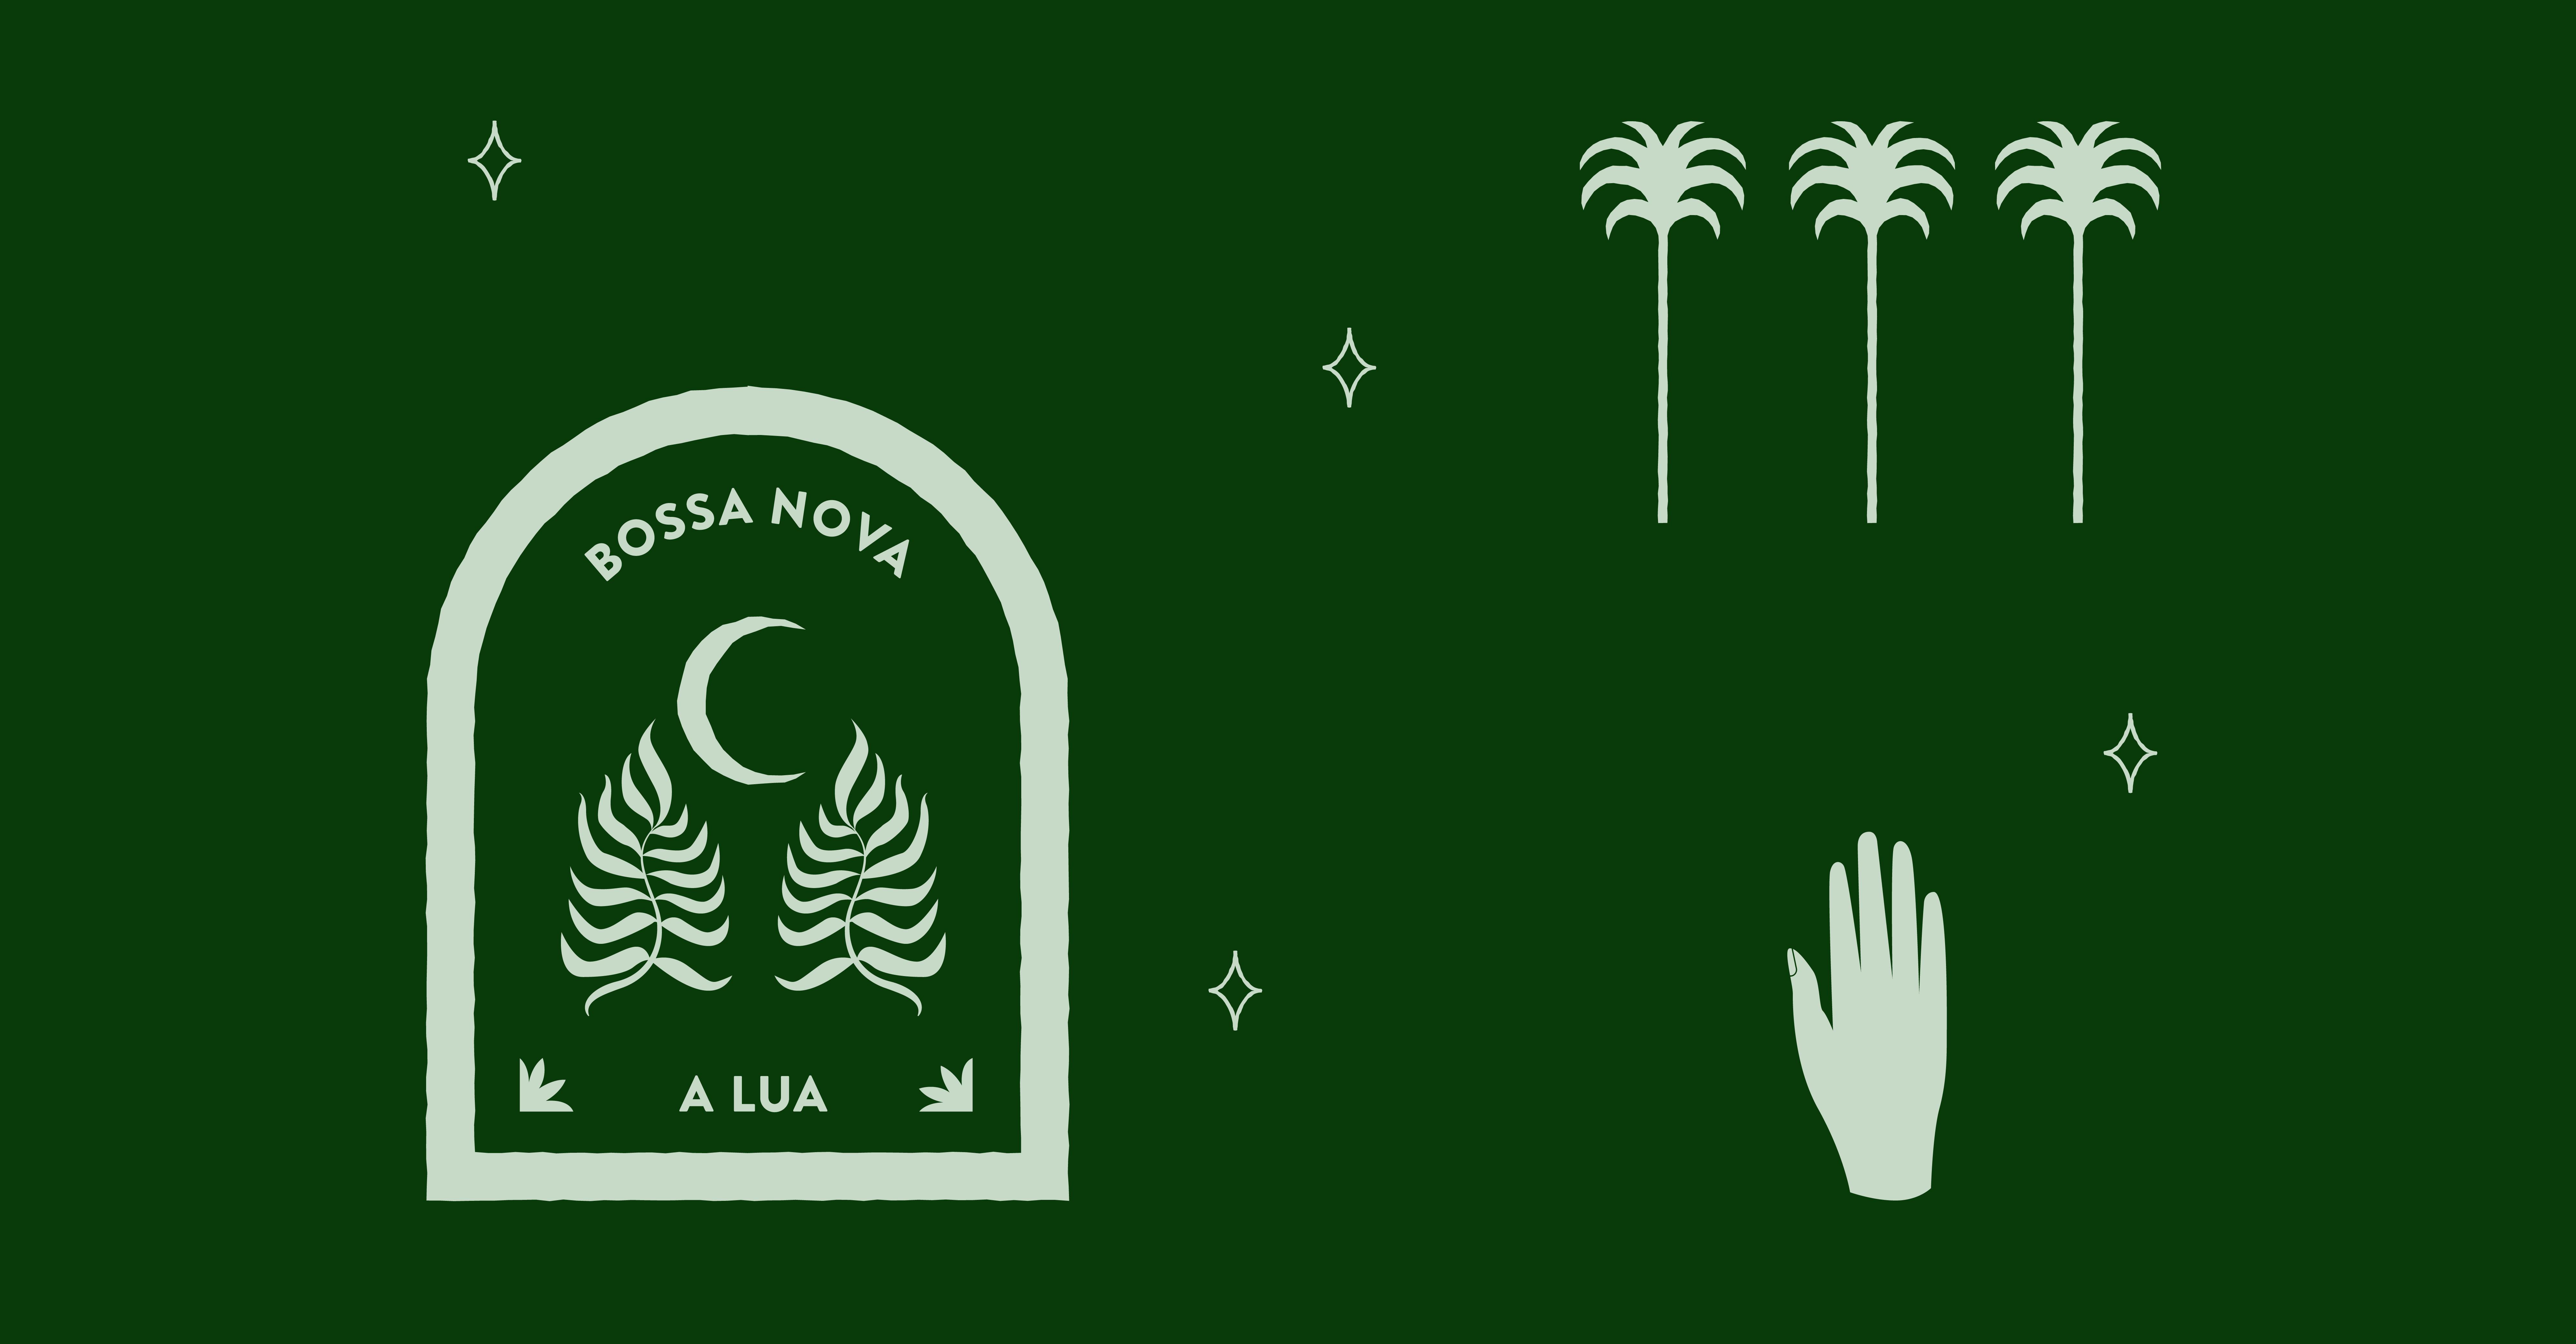 A Lua illustration